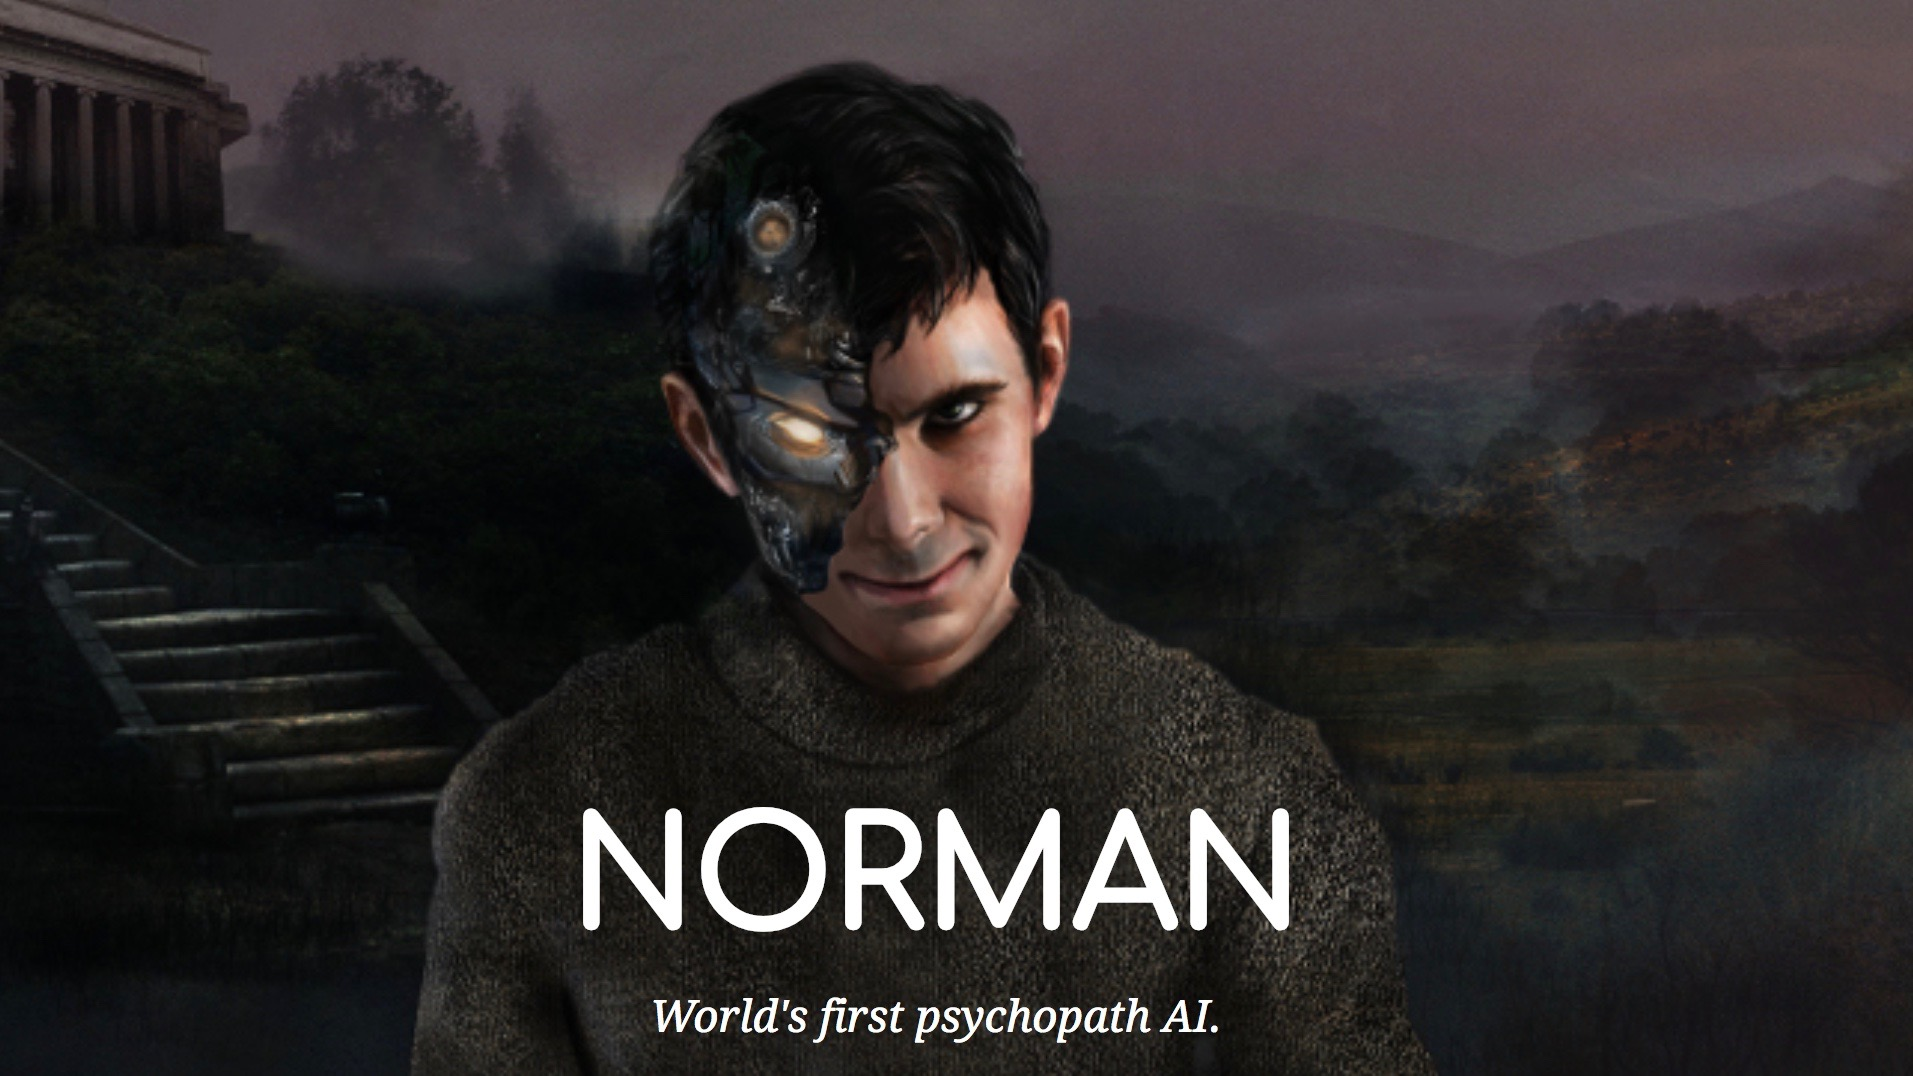 MIT creates 'psychopath' AI using the dark side of Reddit | TechRadar